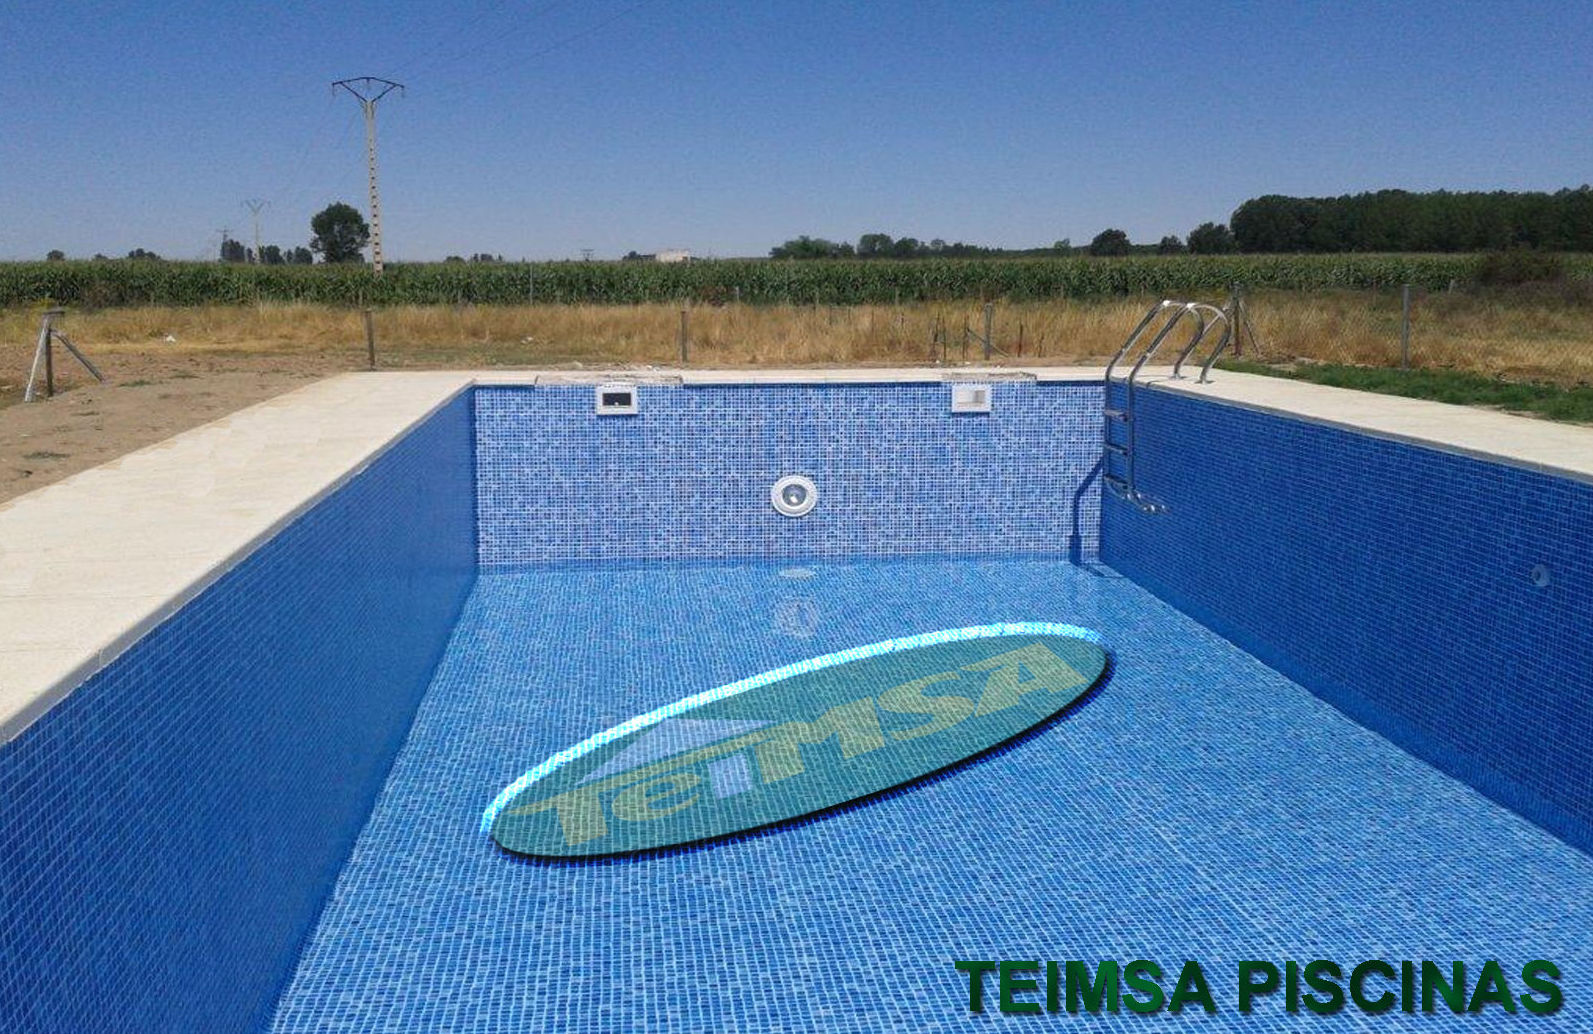 Impermeabilizaci n de piscinas servicios de teimsa for Suministros para piscinas